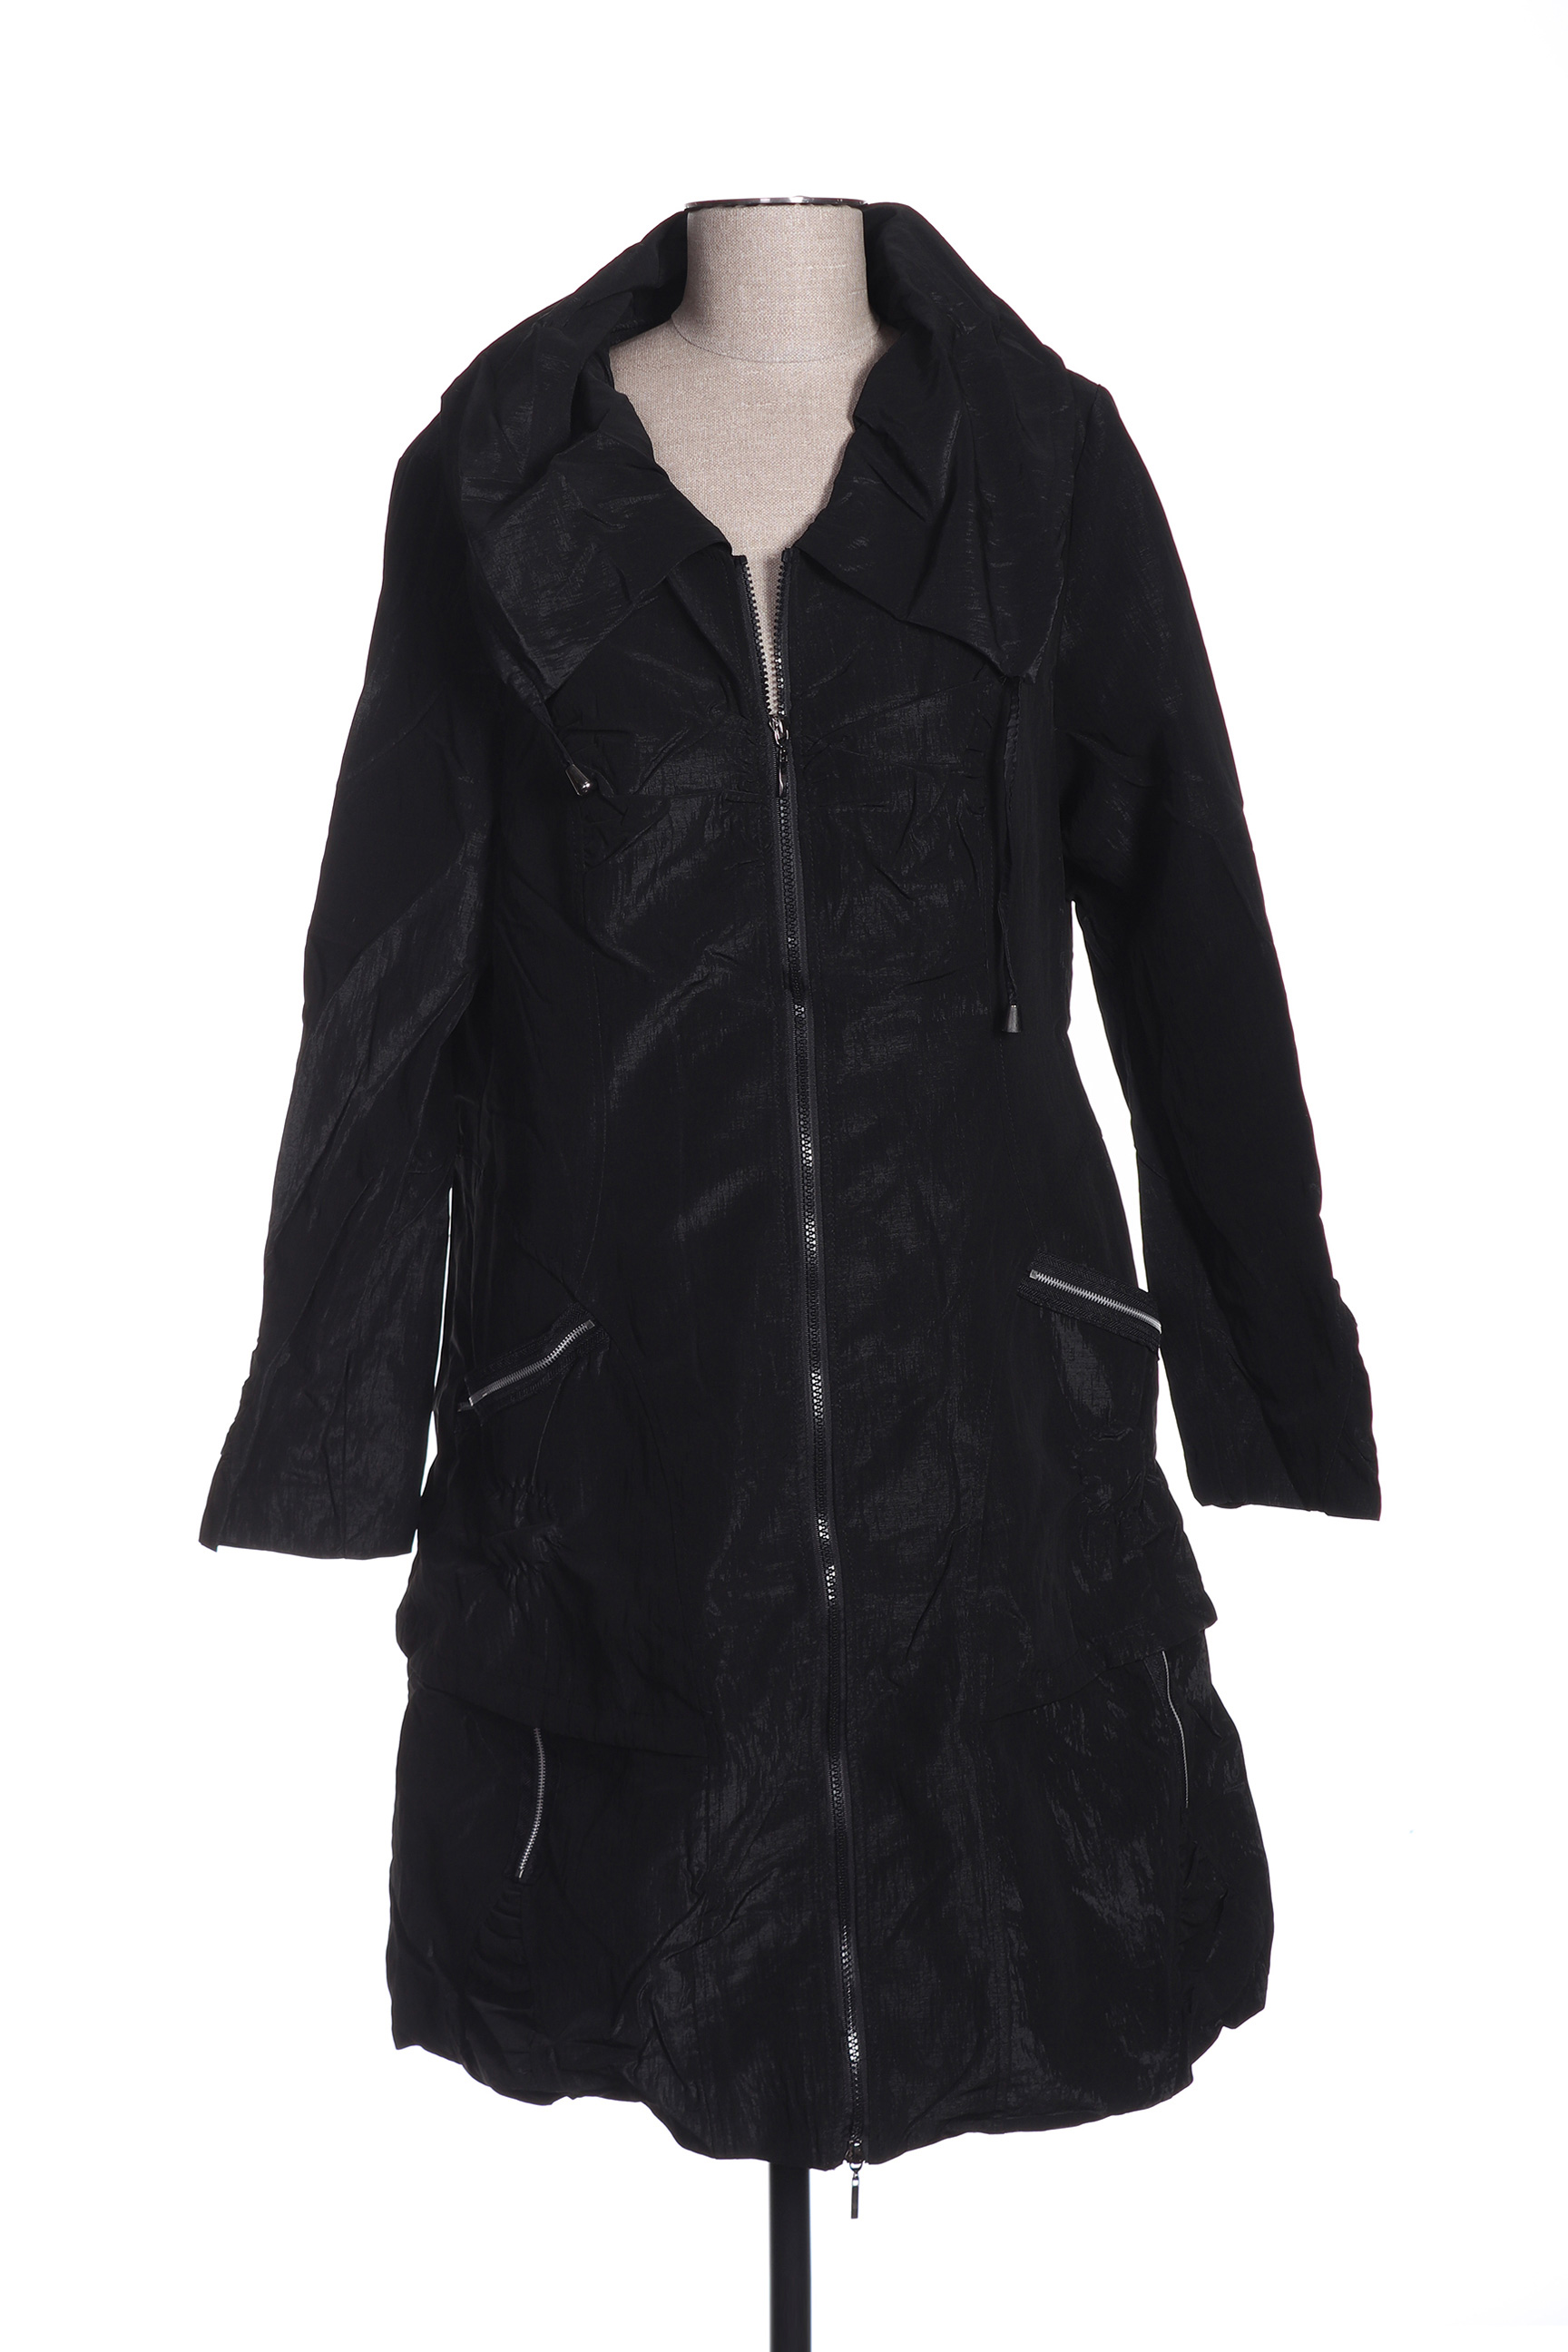 Manteau long femme Franstyle noir taille : 40 24 FR (FR)